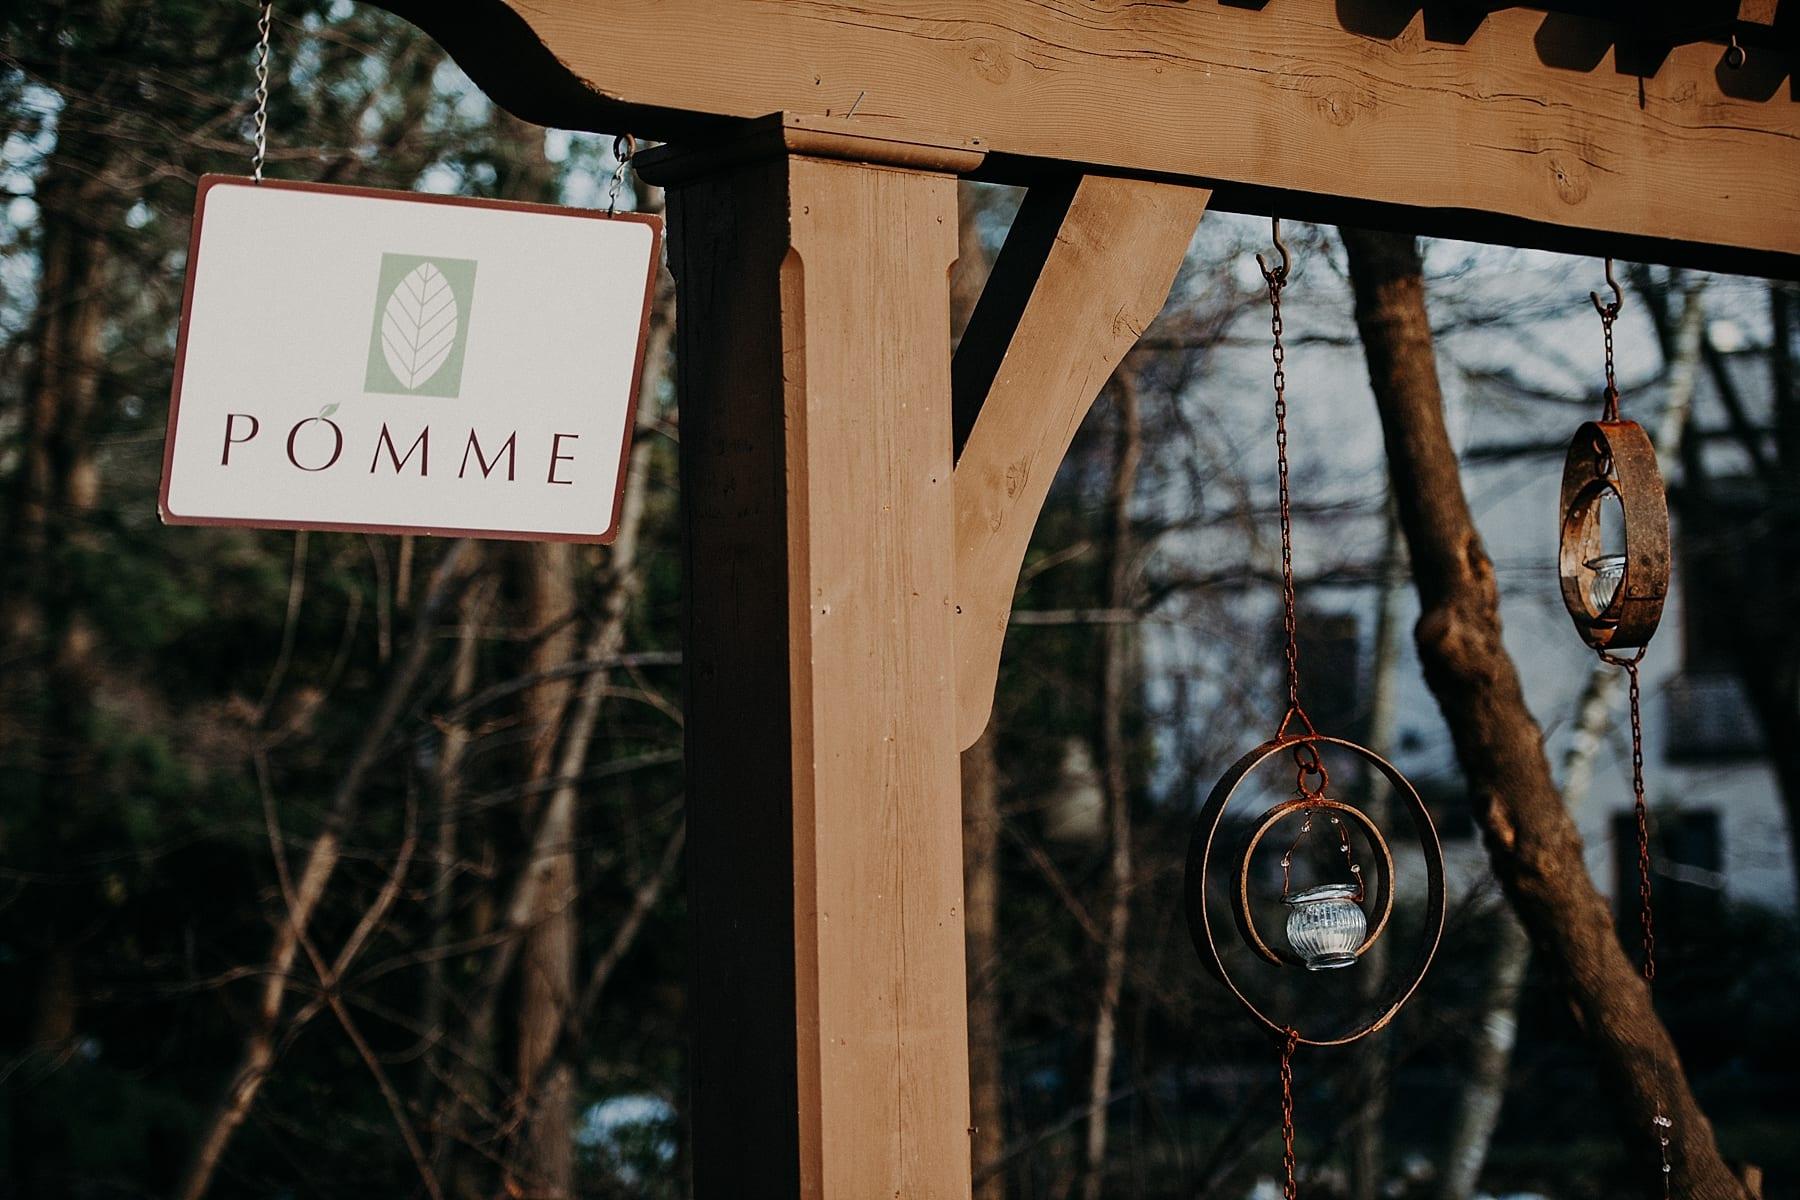 Pomme-Mainlineweddingvenue-tylerboye-002